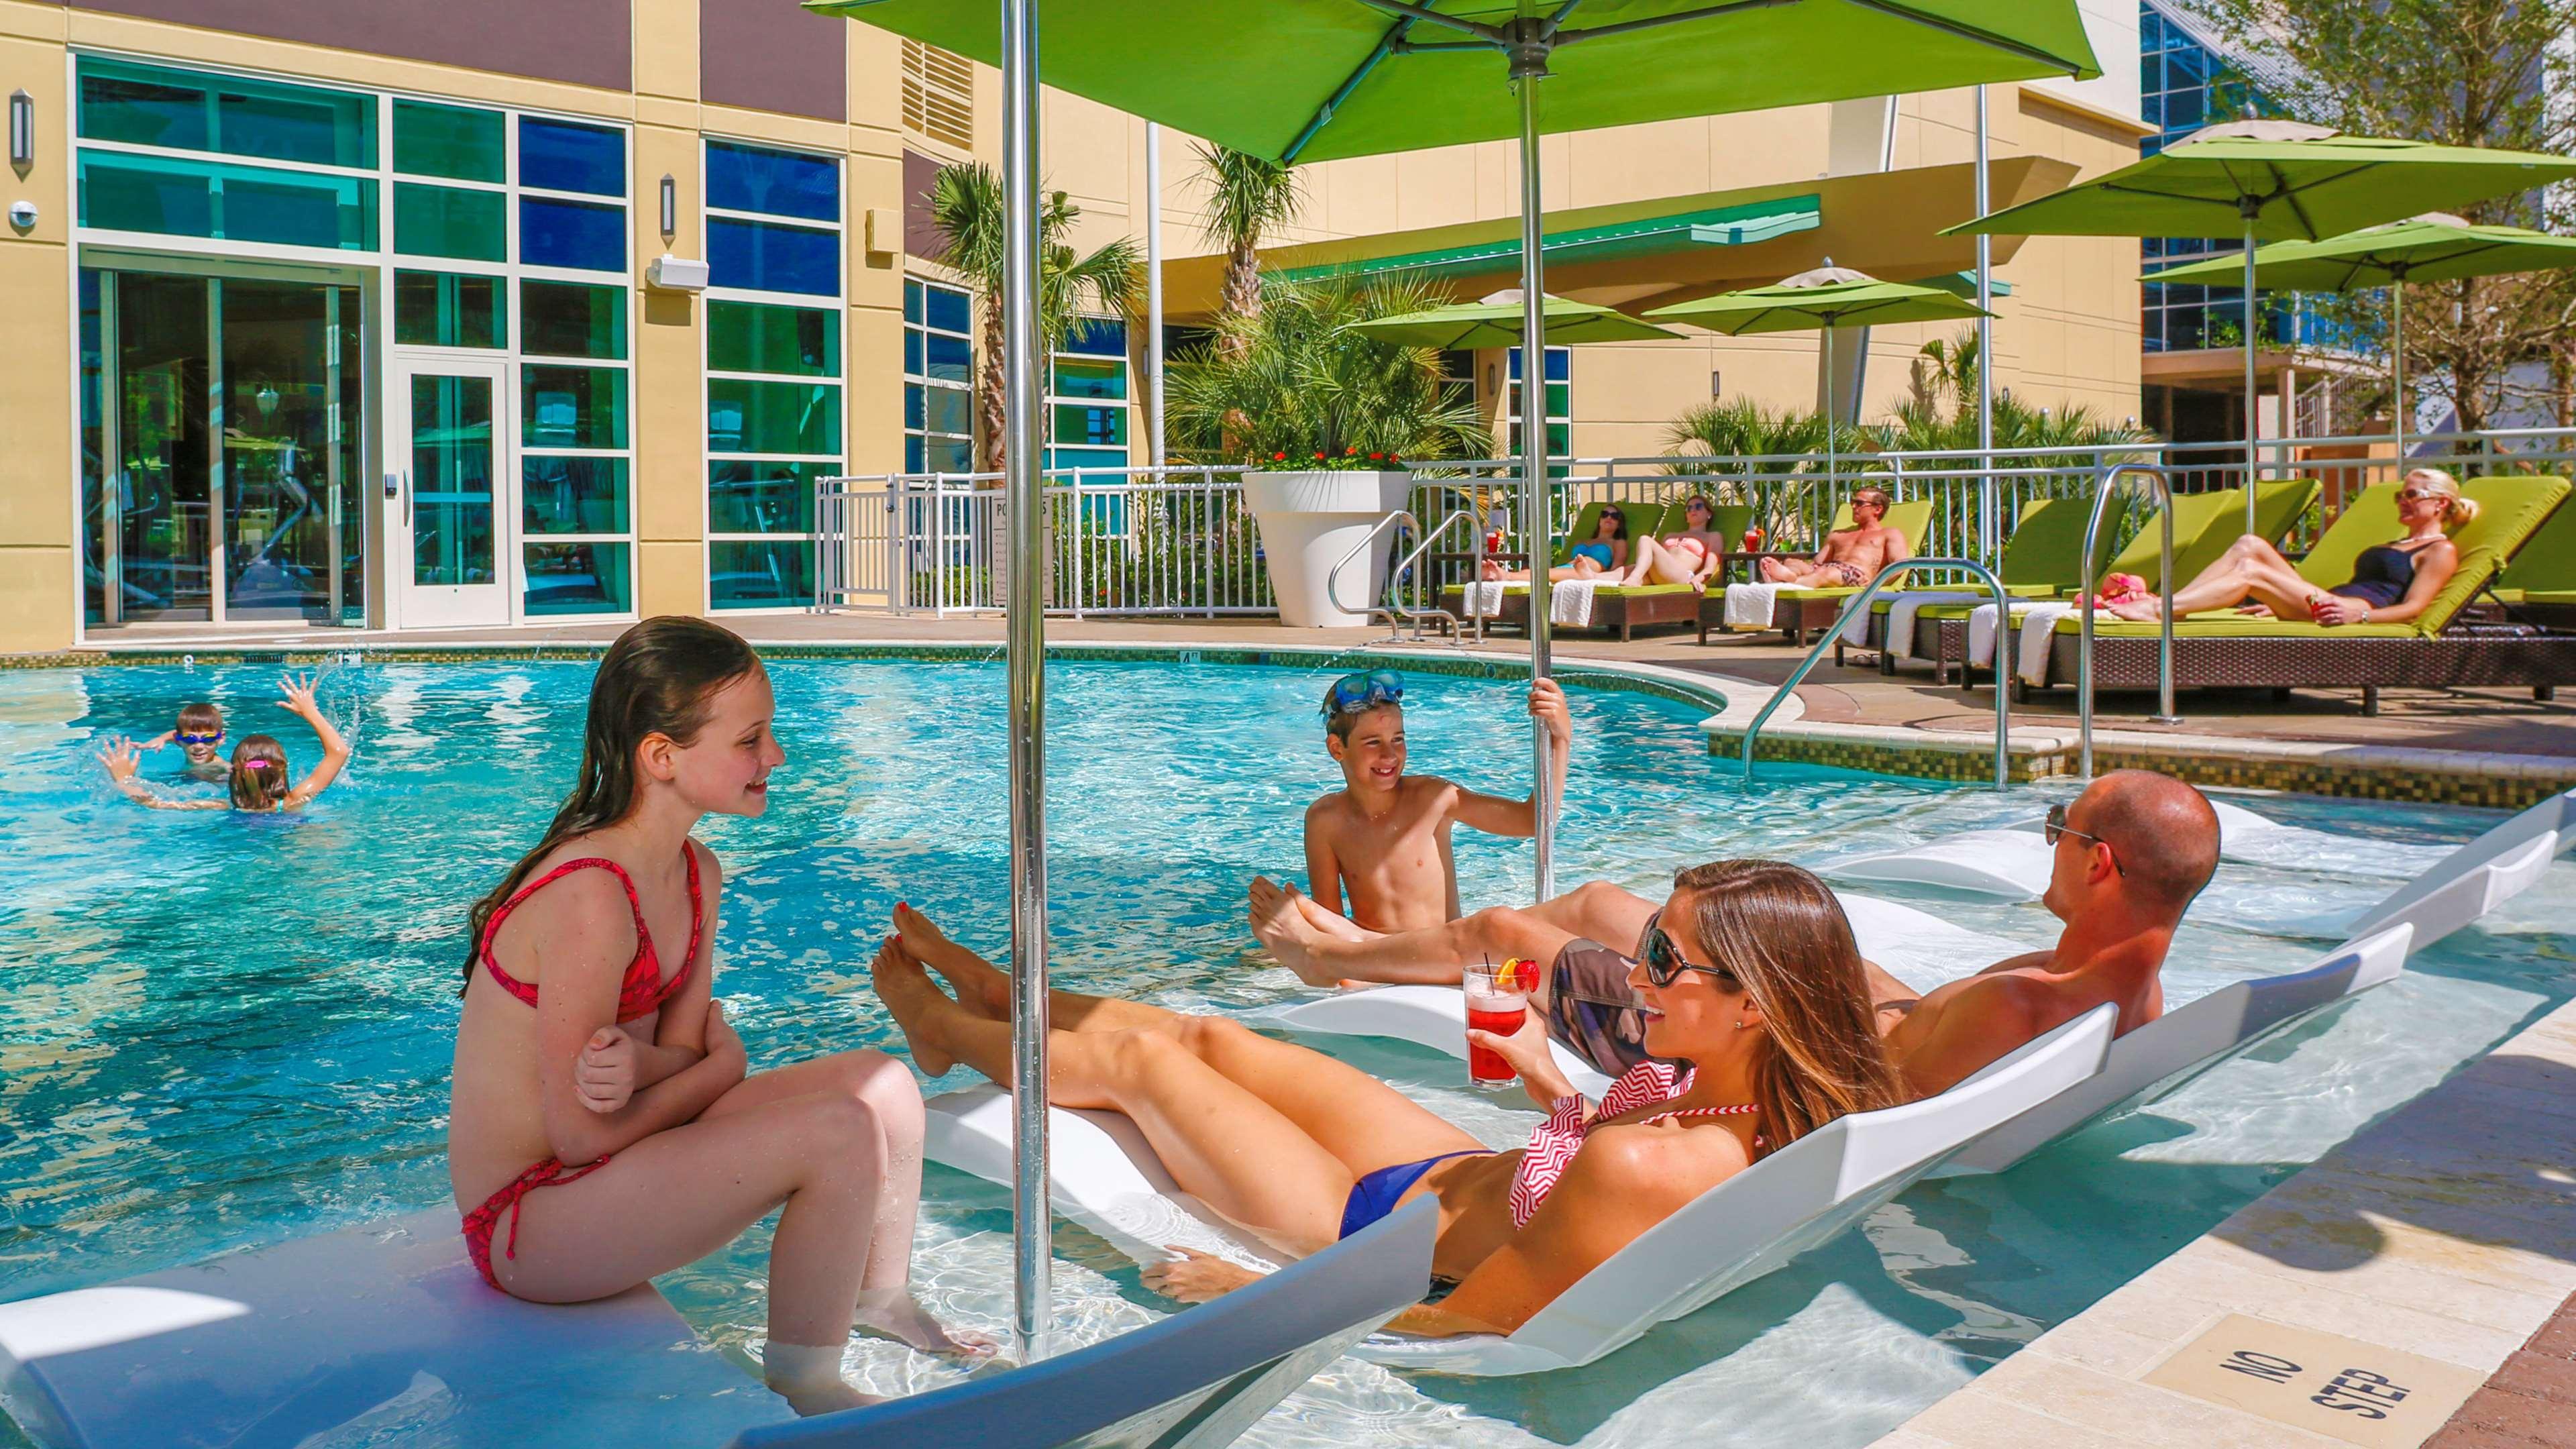 Hilton Garden Inn Virginia Beach Oceanfront image 10